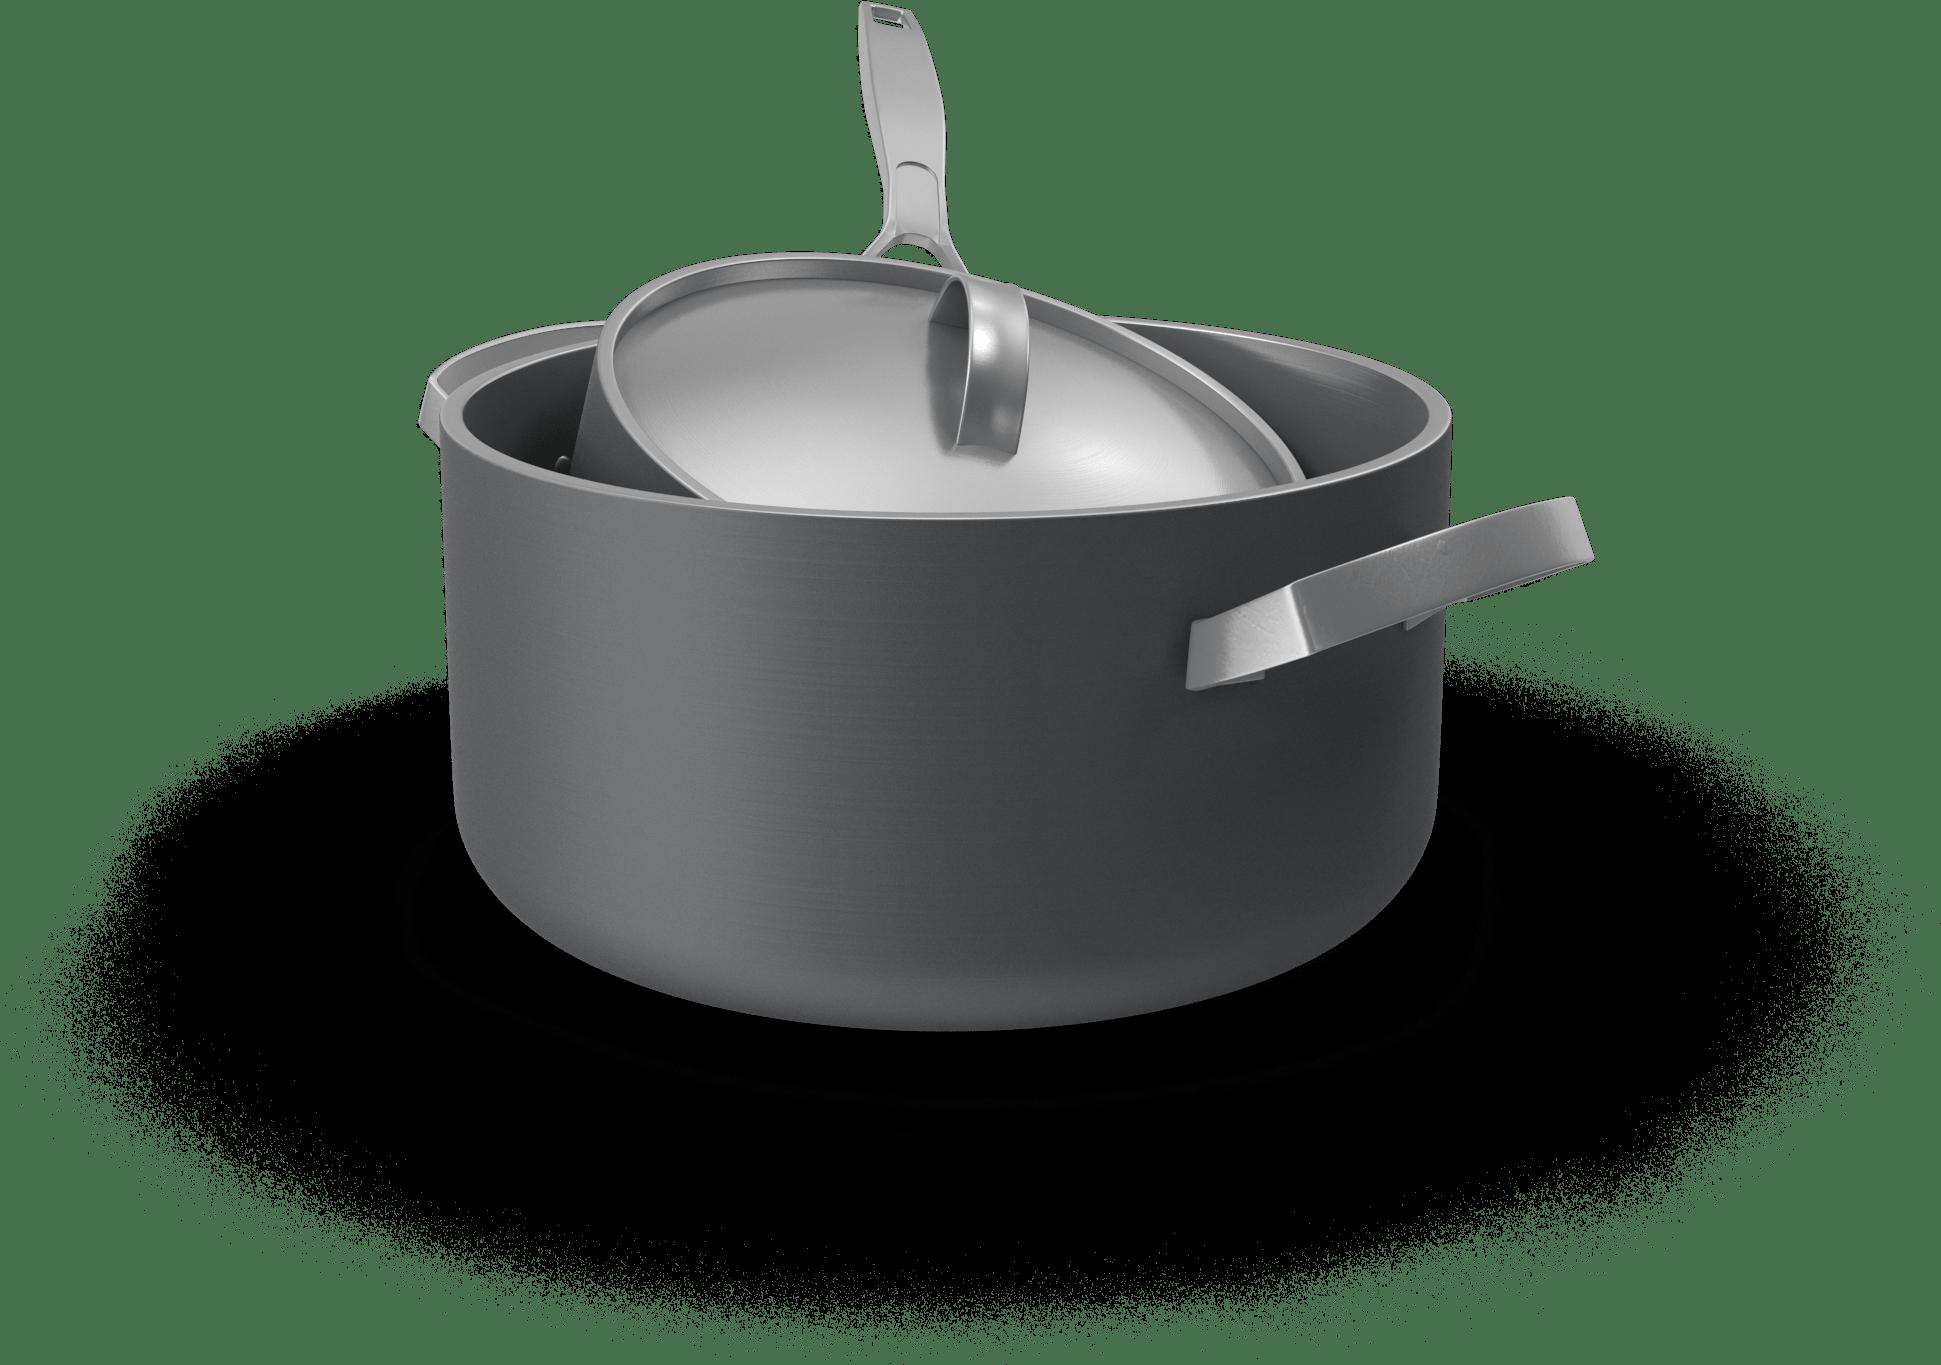 casserolle